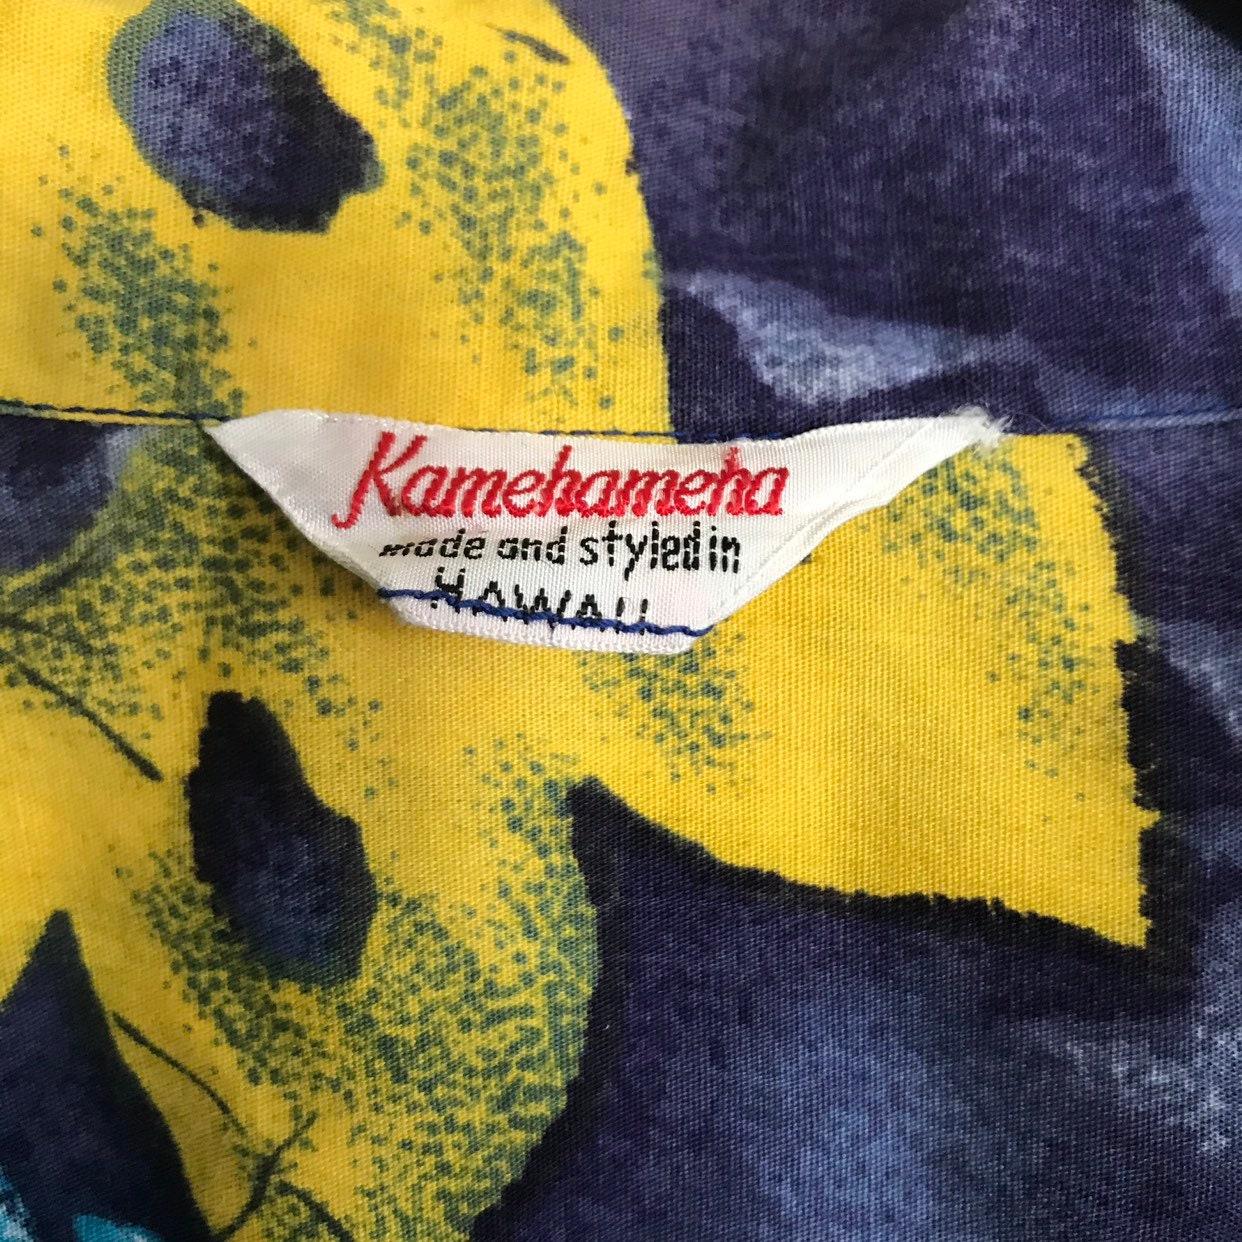 1950s Mens Hats | 50s Vintage Men's Hats Vintage Kamehameha 1950s 1960s 50s 60s Hawaiian Aloha Tiki Shaheen Cabana Shirt $29.50 AT vintagedancer.com